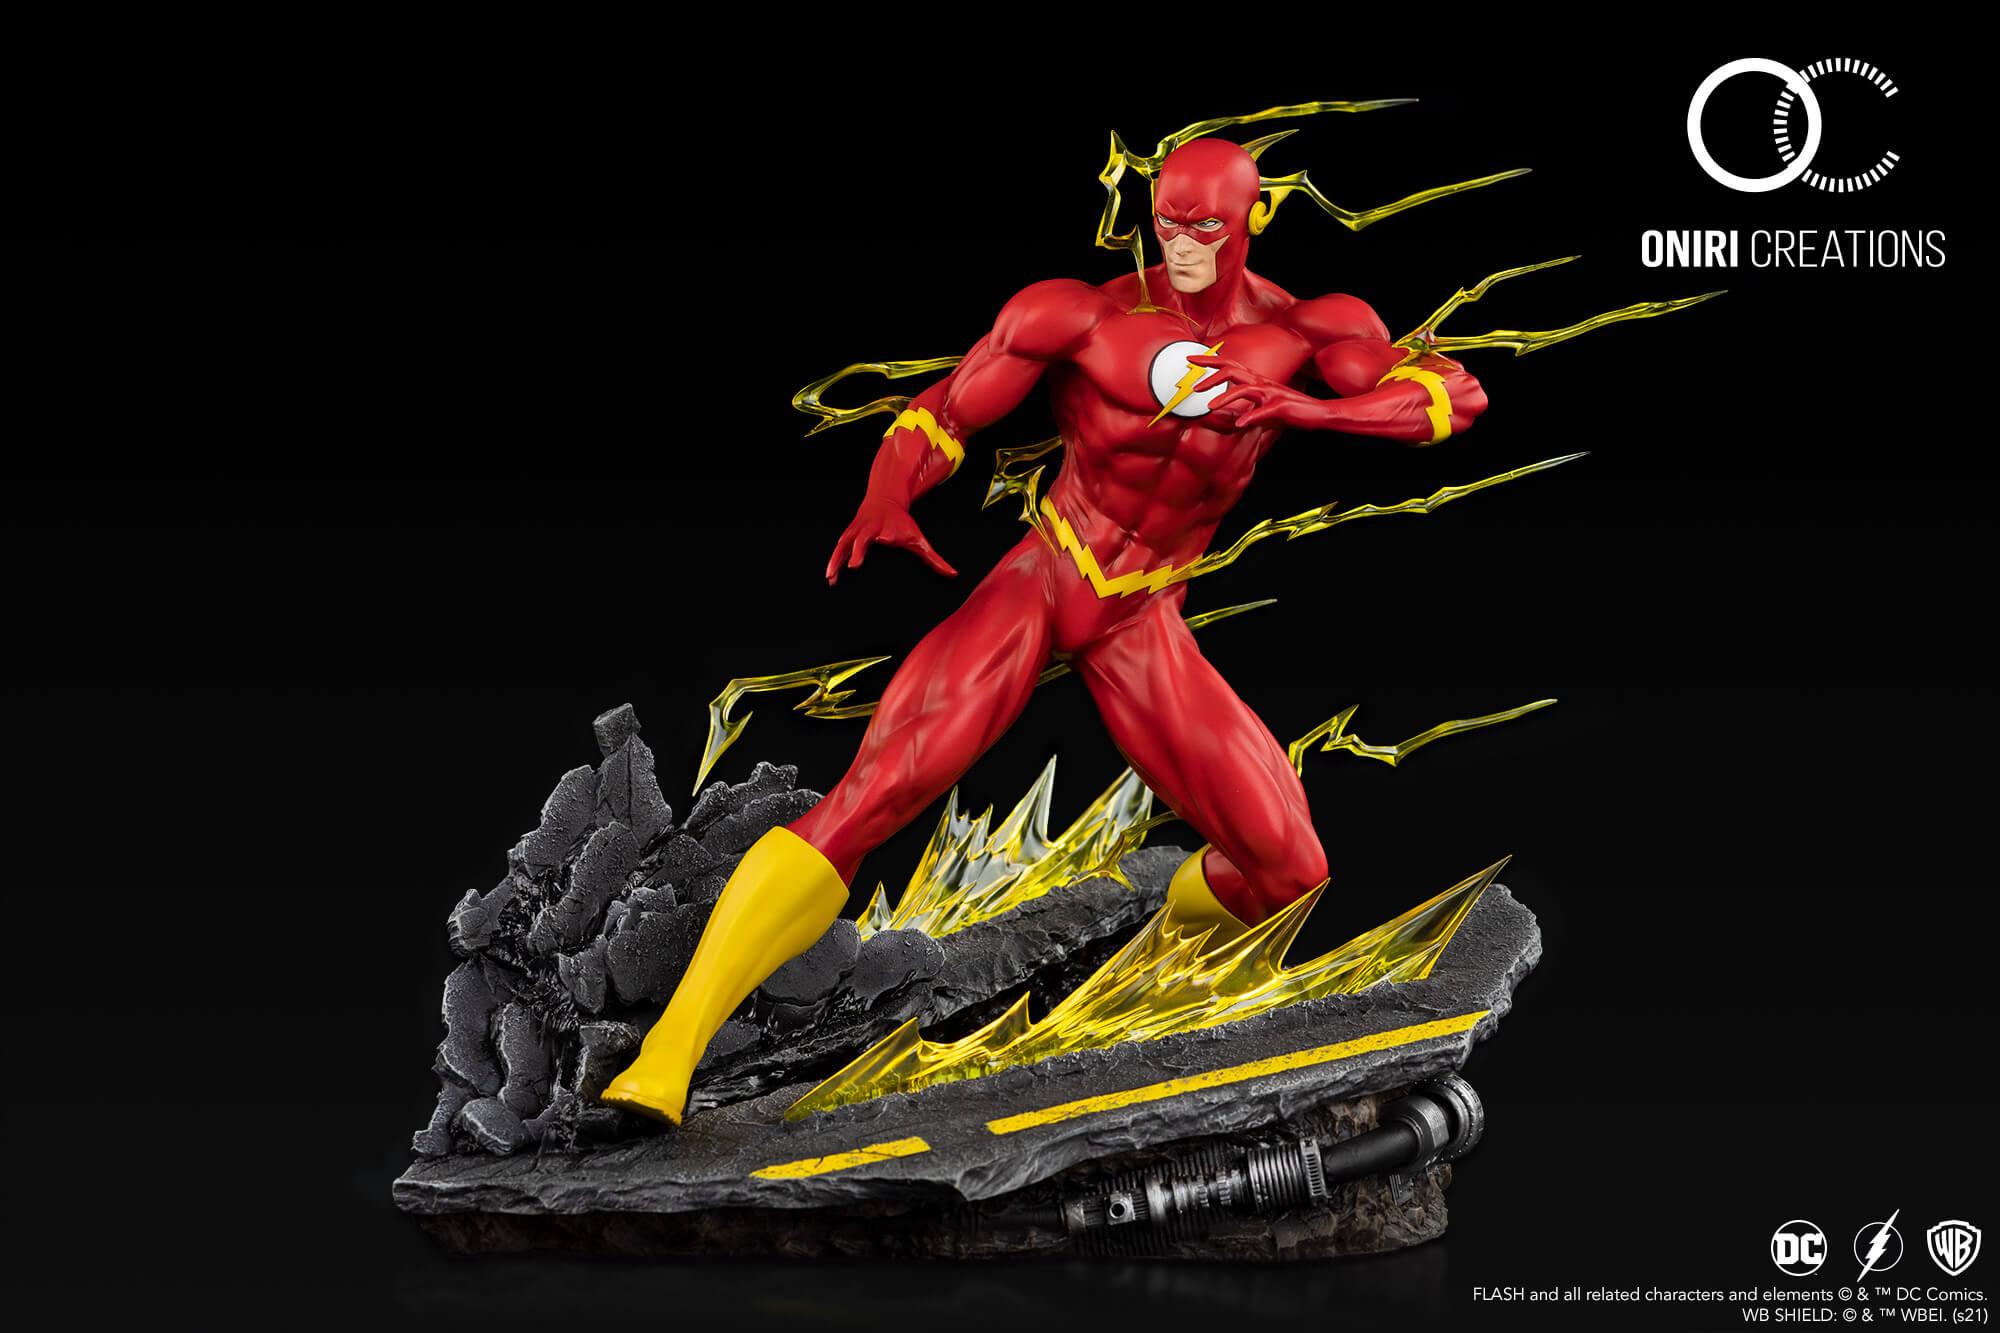 Oniri Créations : DC Comics - The Flash (1/6) The-Flash-Statue-Oniri-Creations01